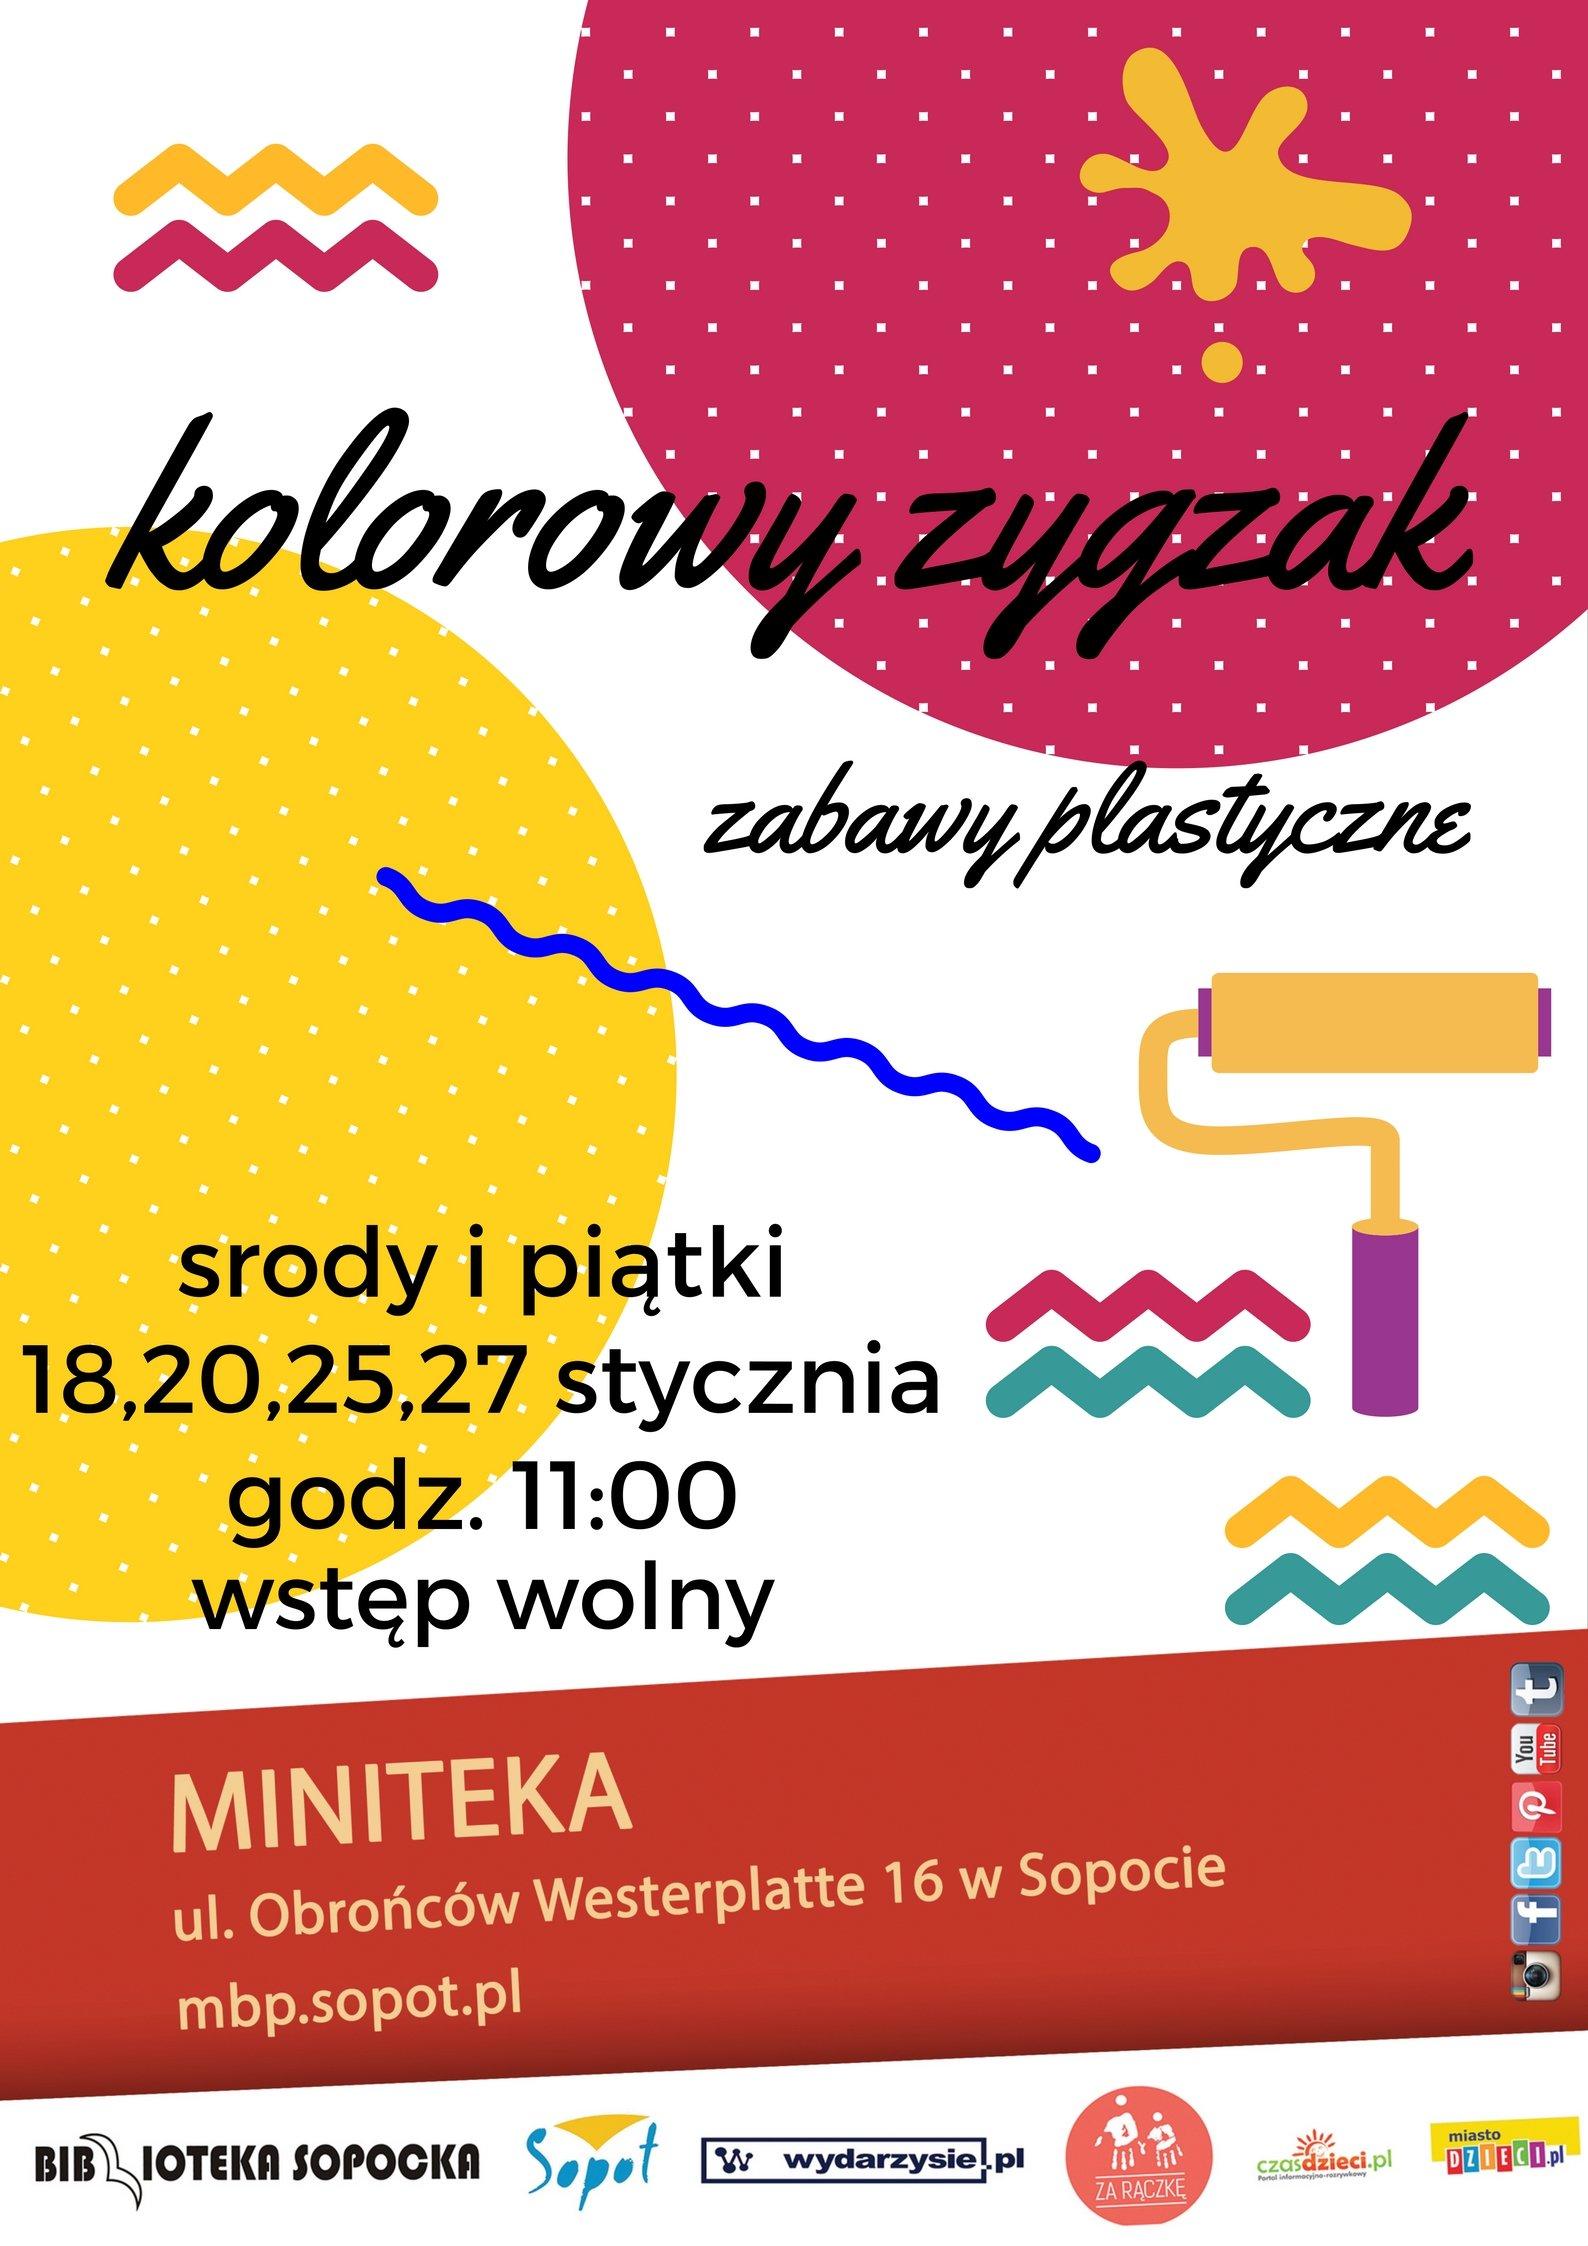 Kolorowy zygzak ferie 2017 Sopot